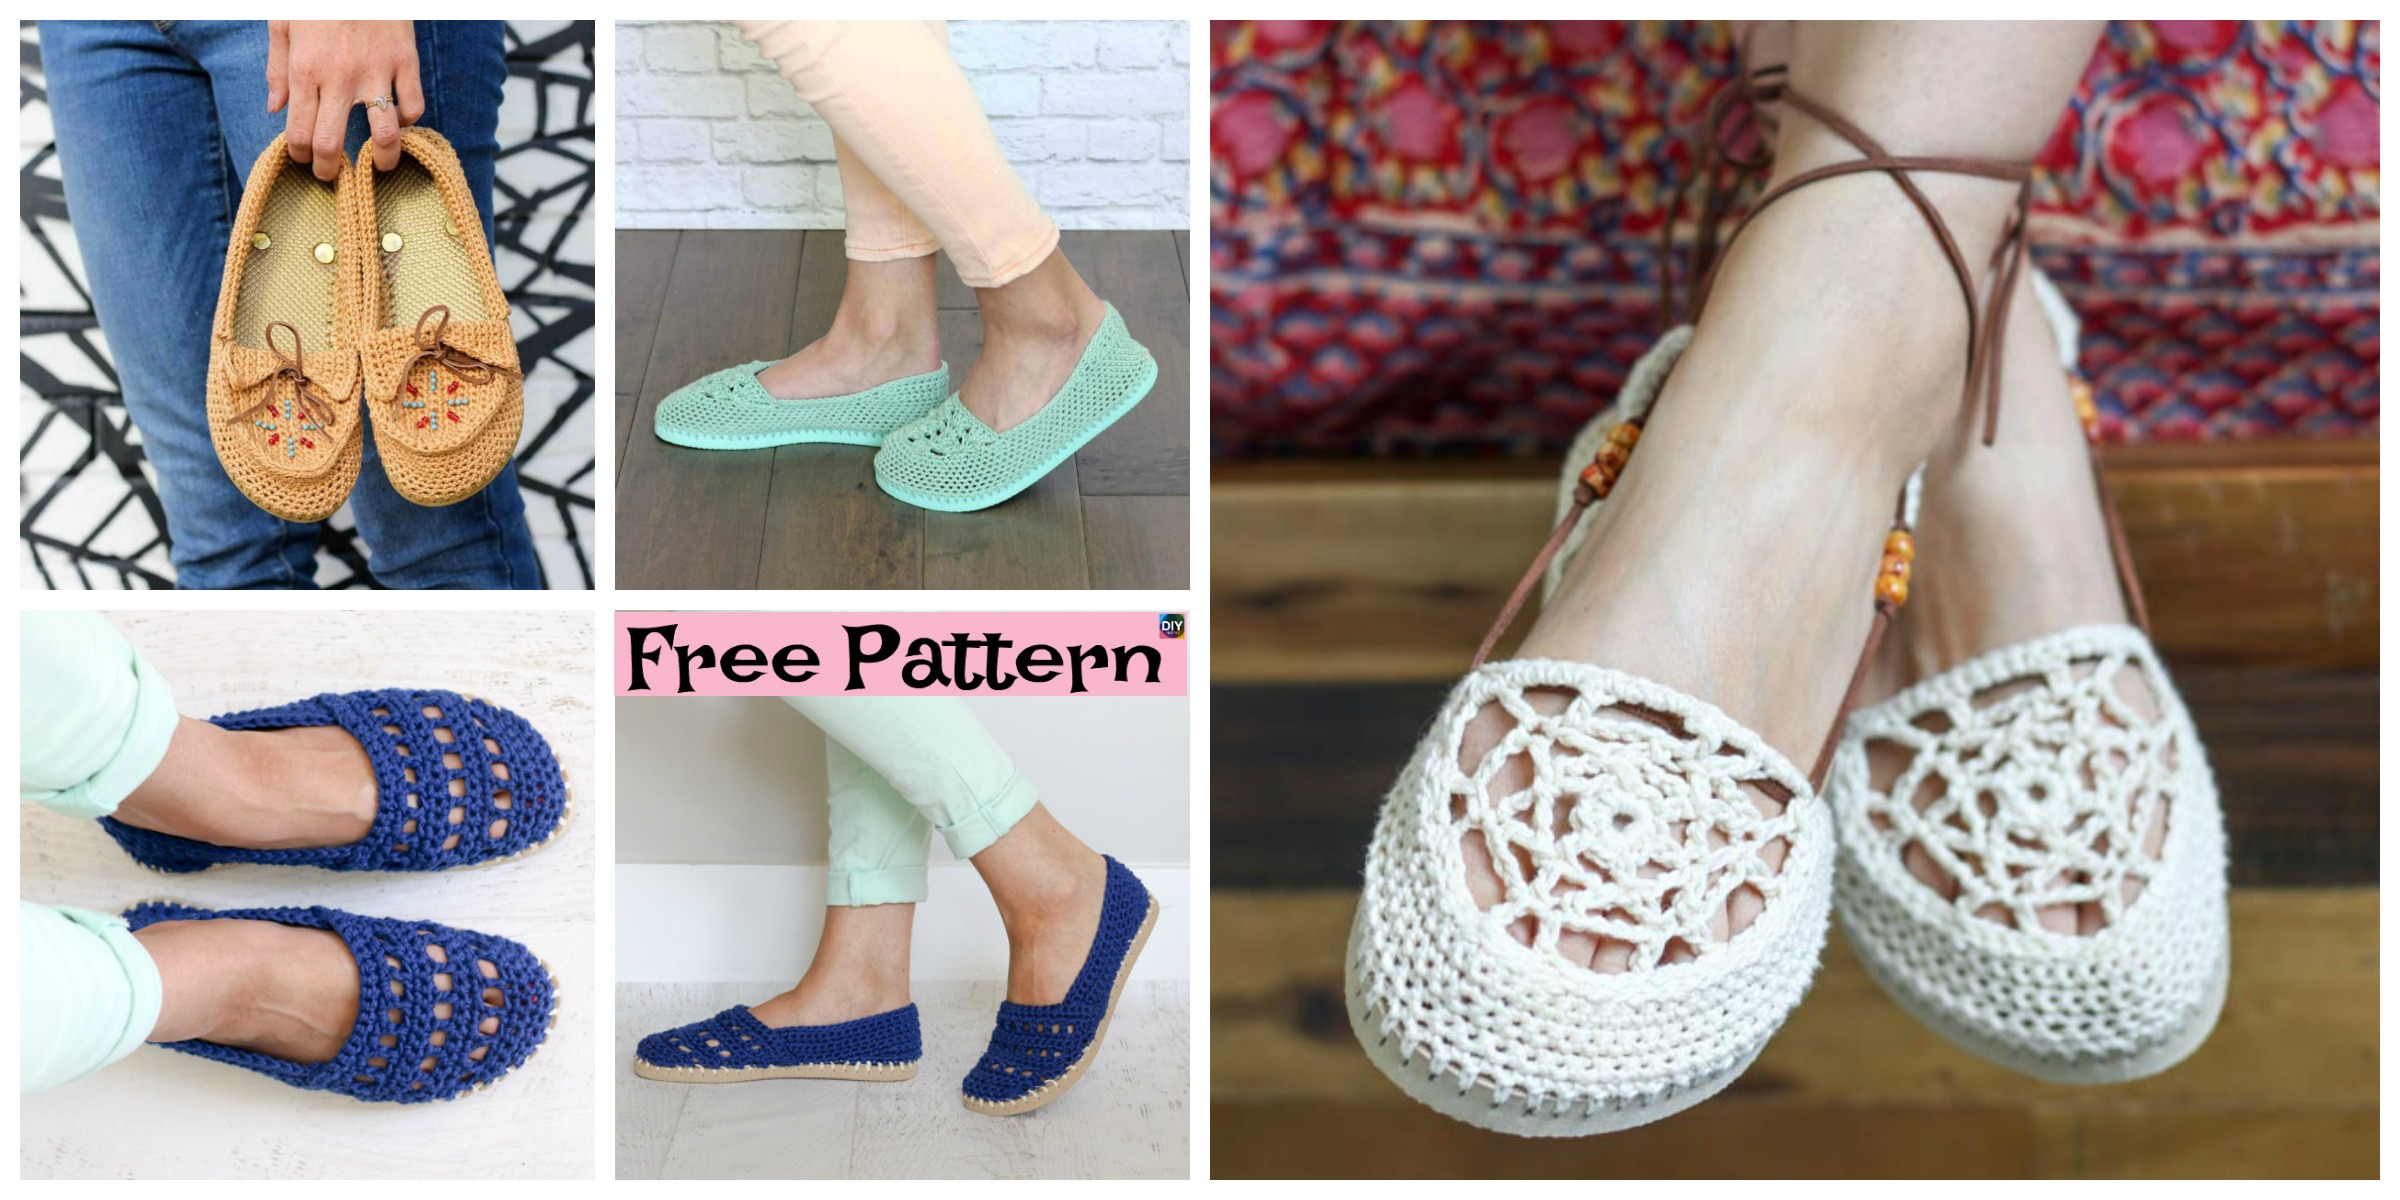 Crochet Slippers Using Flip Flop Soles – Free Patterns